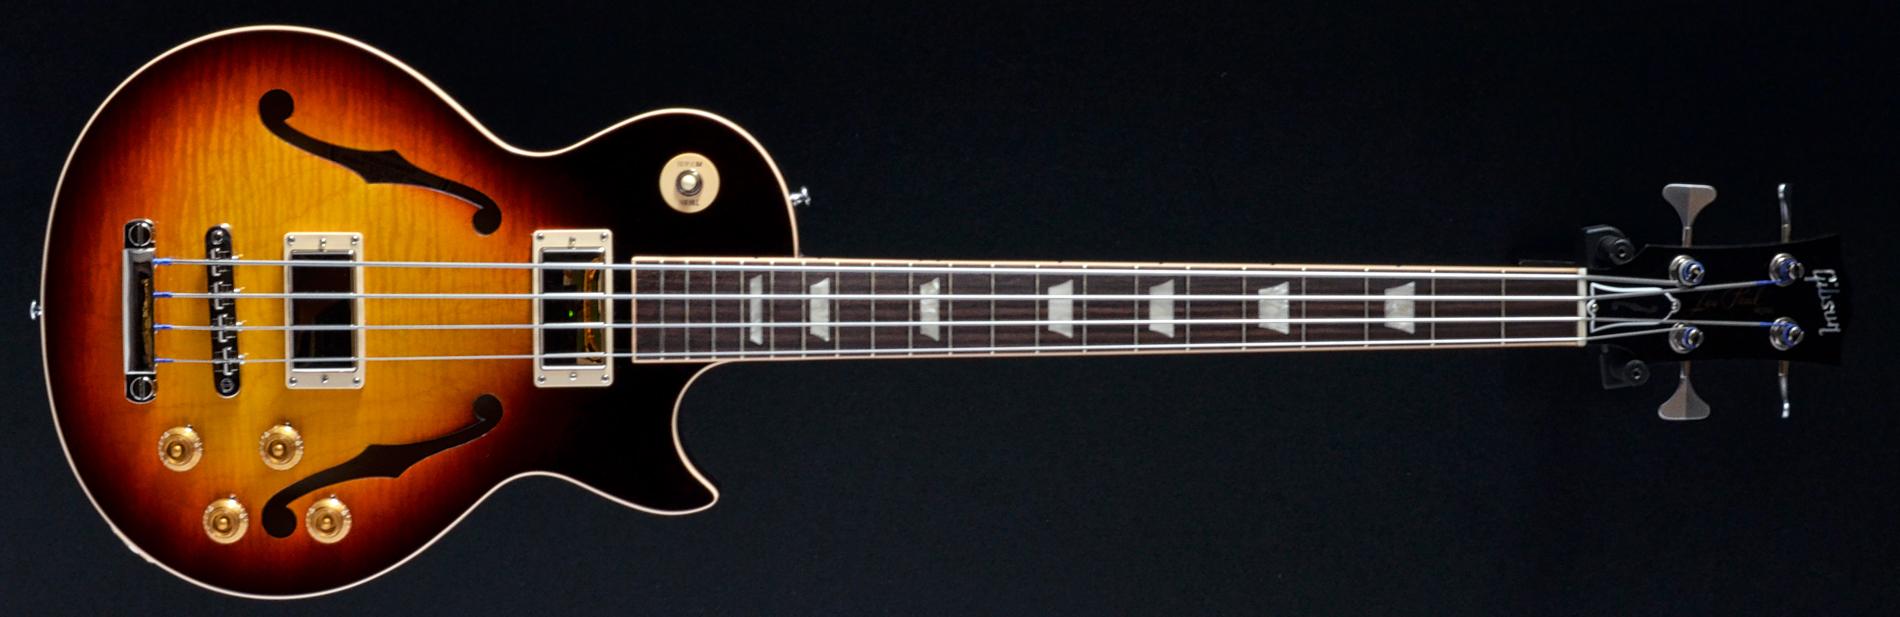 gibson les paul memphis special es four string bass bass